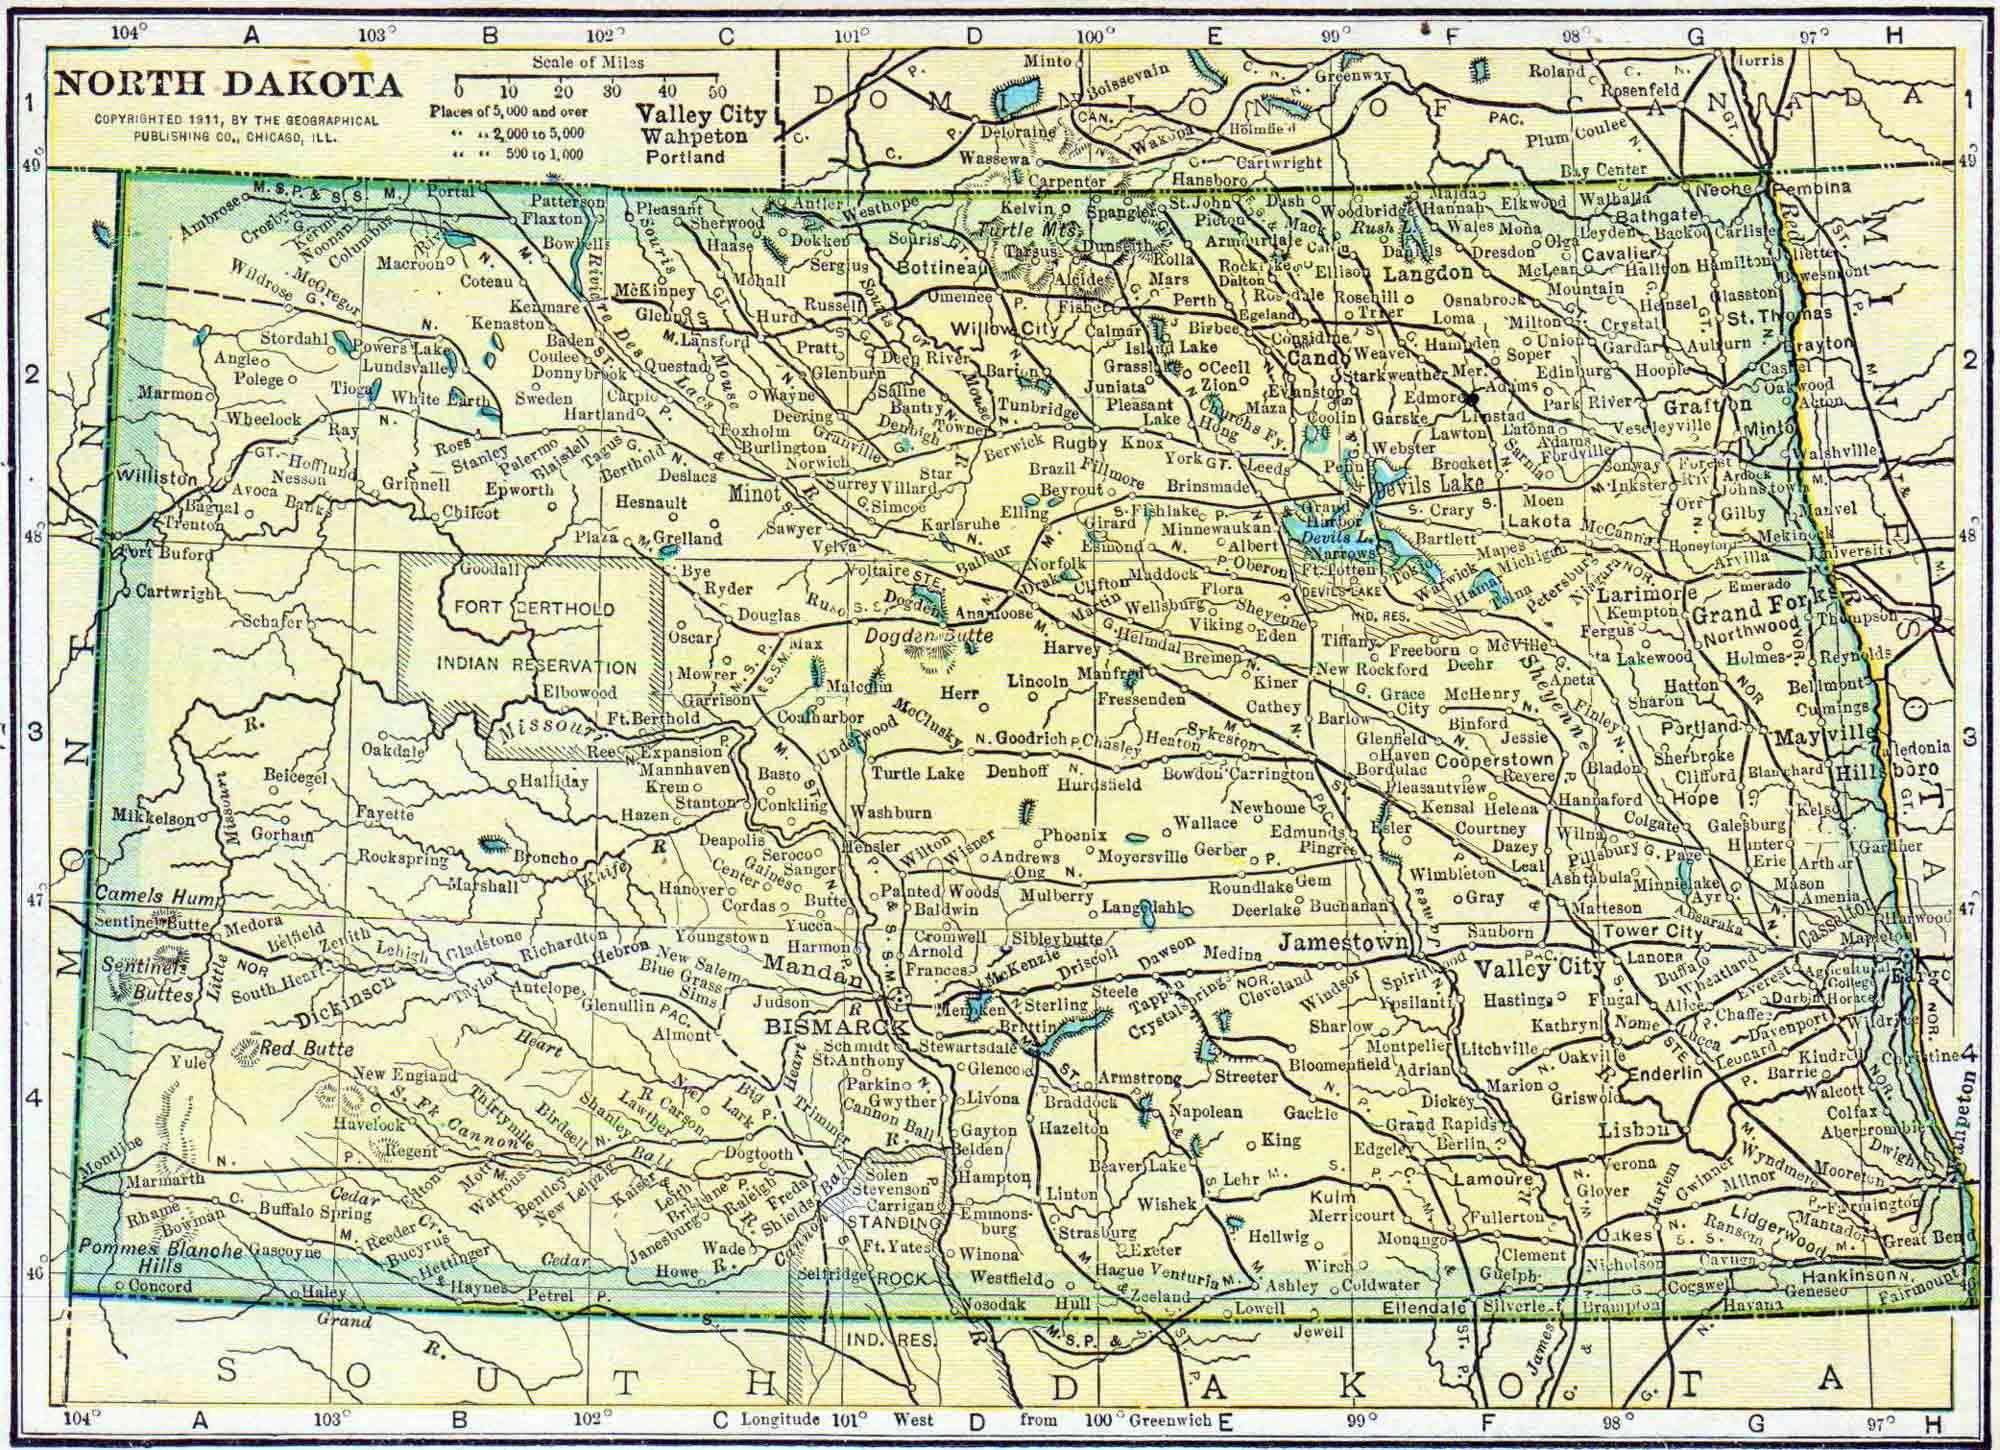 1910 North Dakota Census Map | Access Genealogy